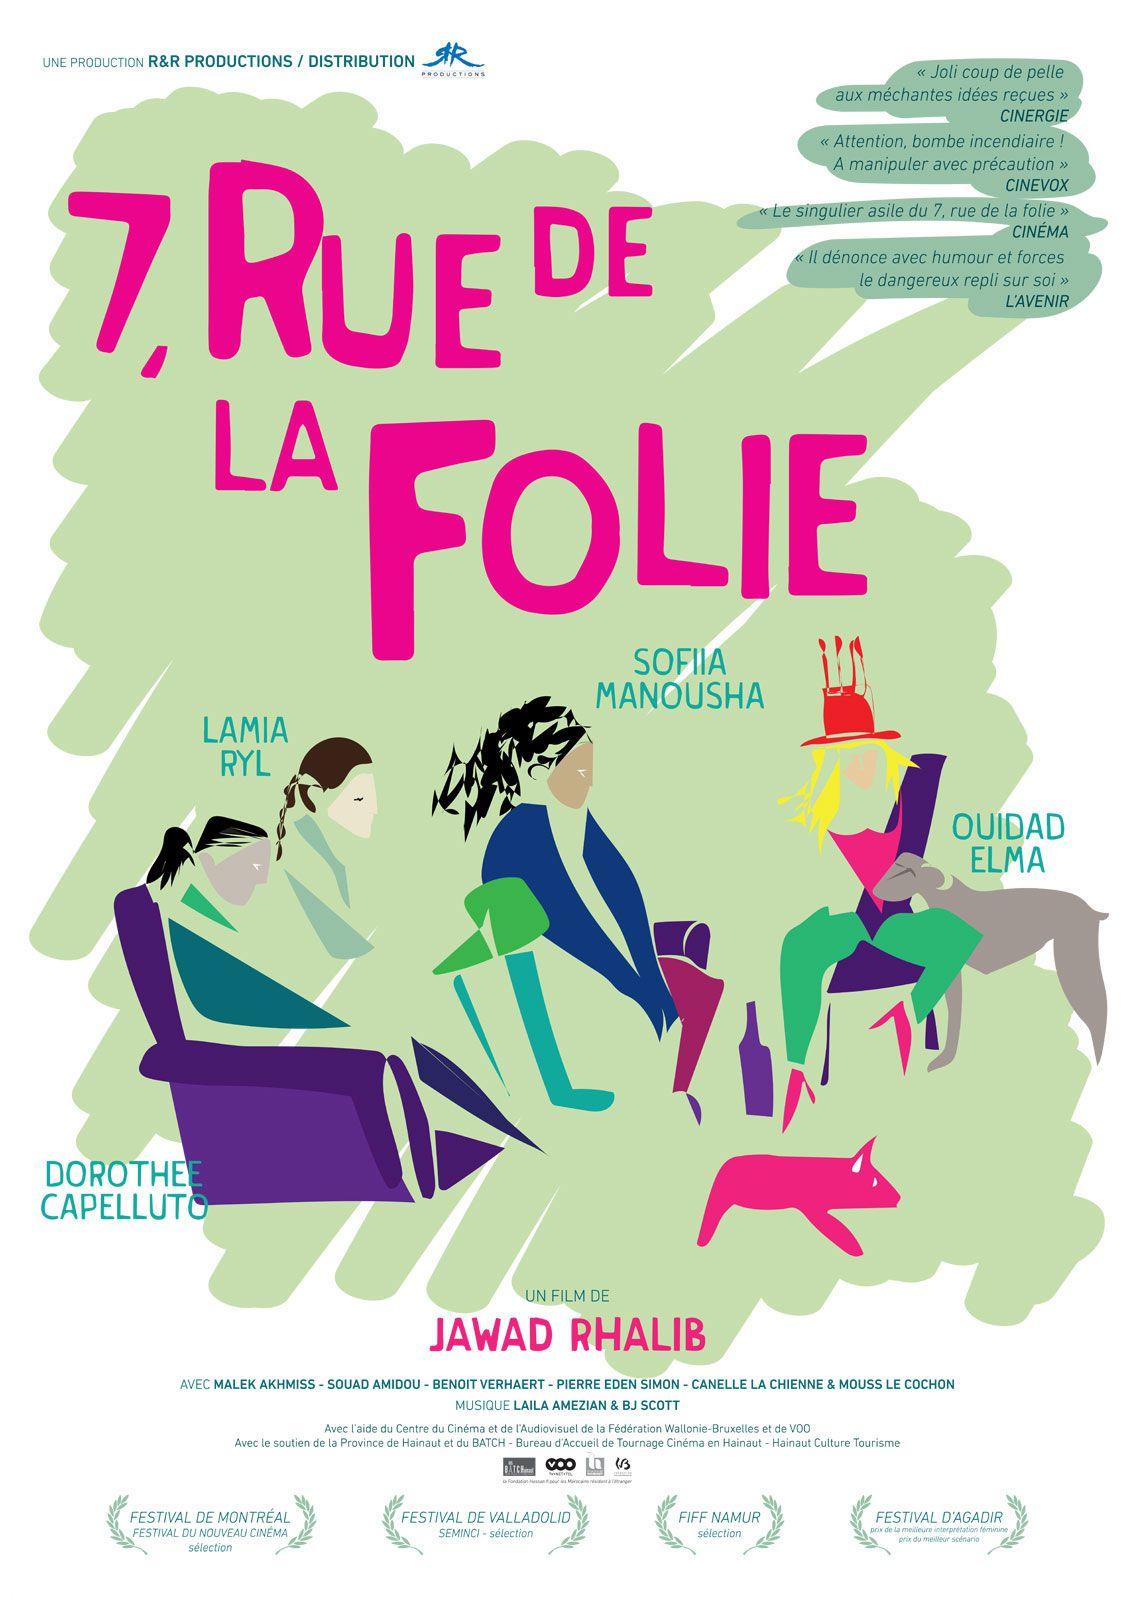 7, rue de la Folie - Film (2014)